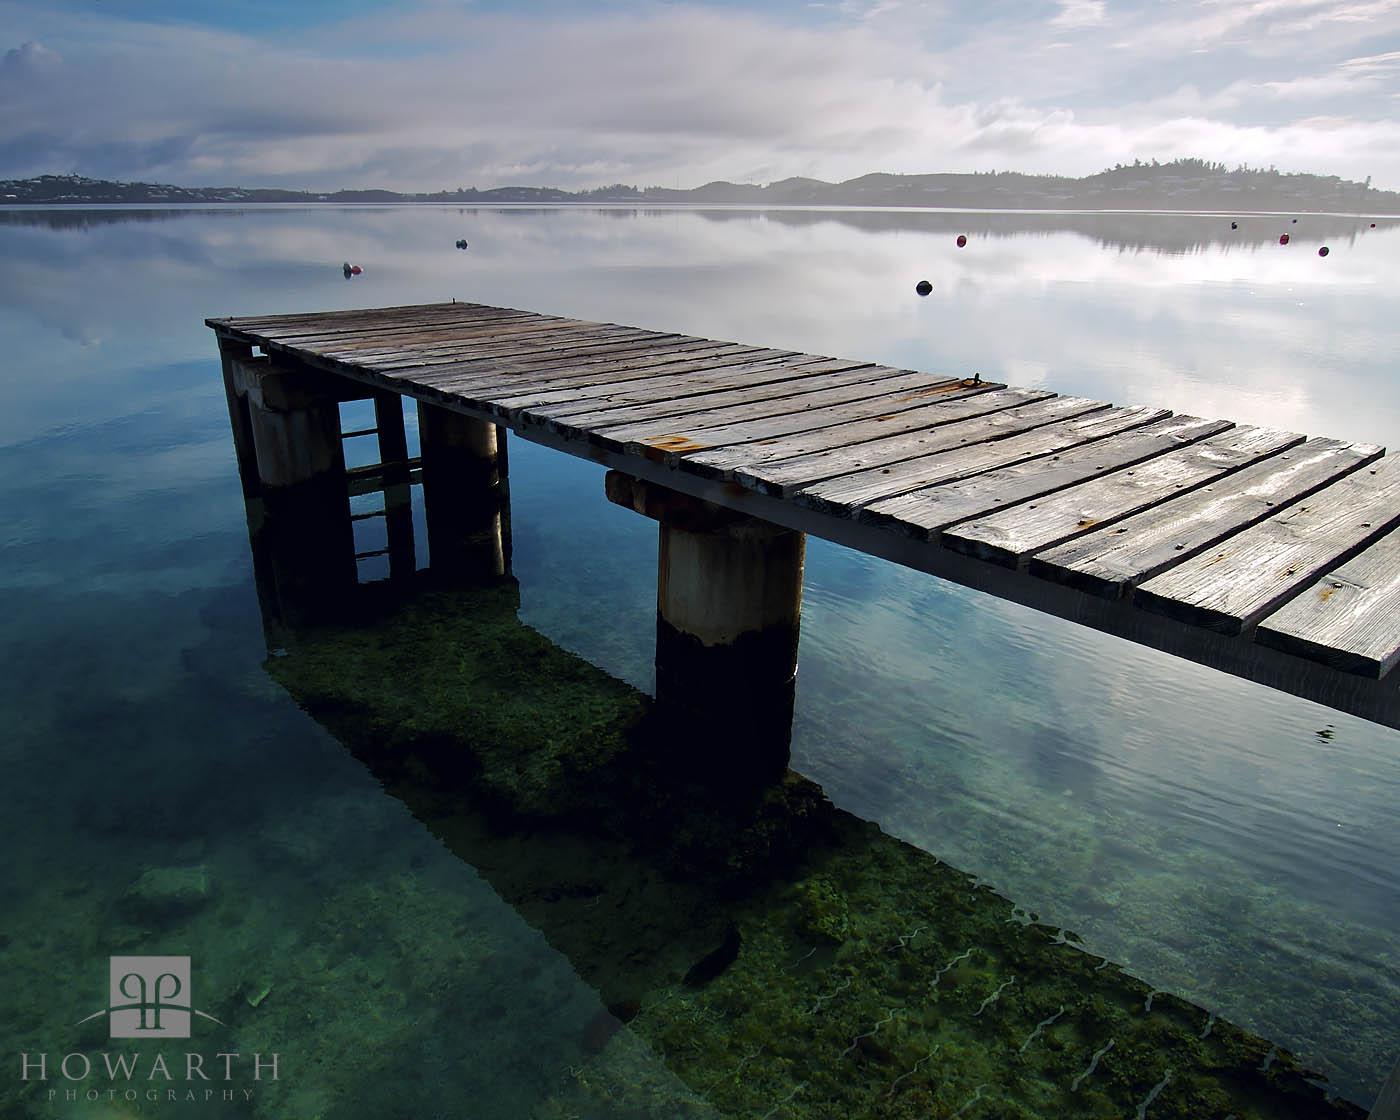 harrington, dock, smiths, sound, still, water, photo